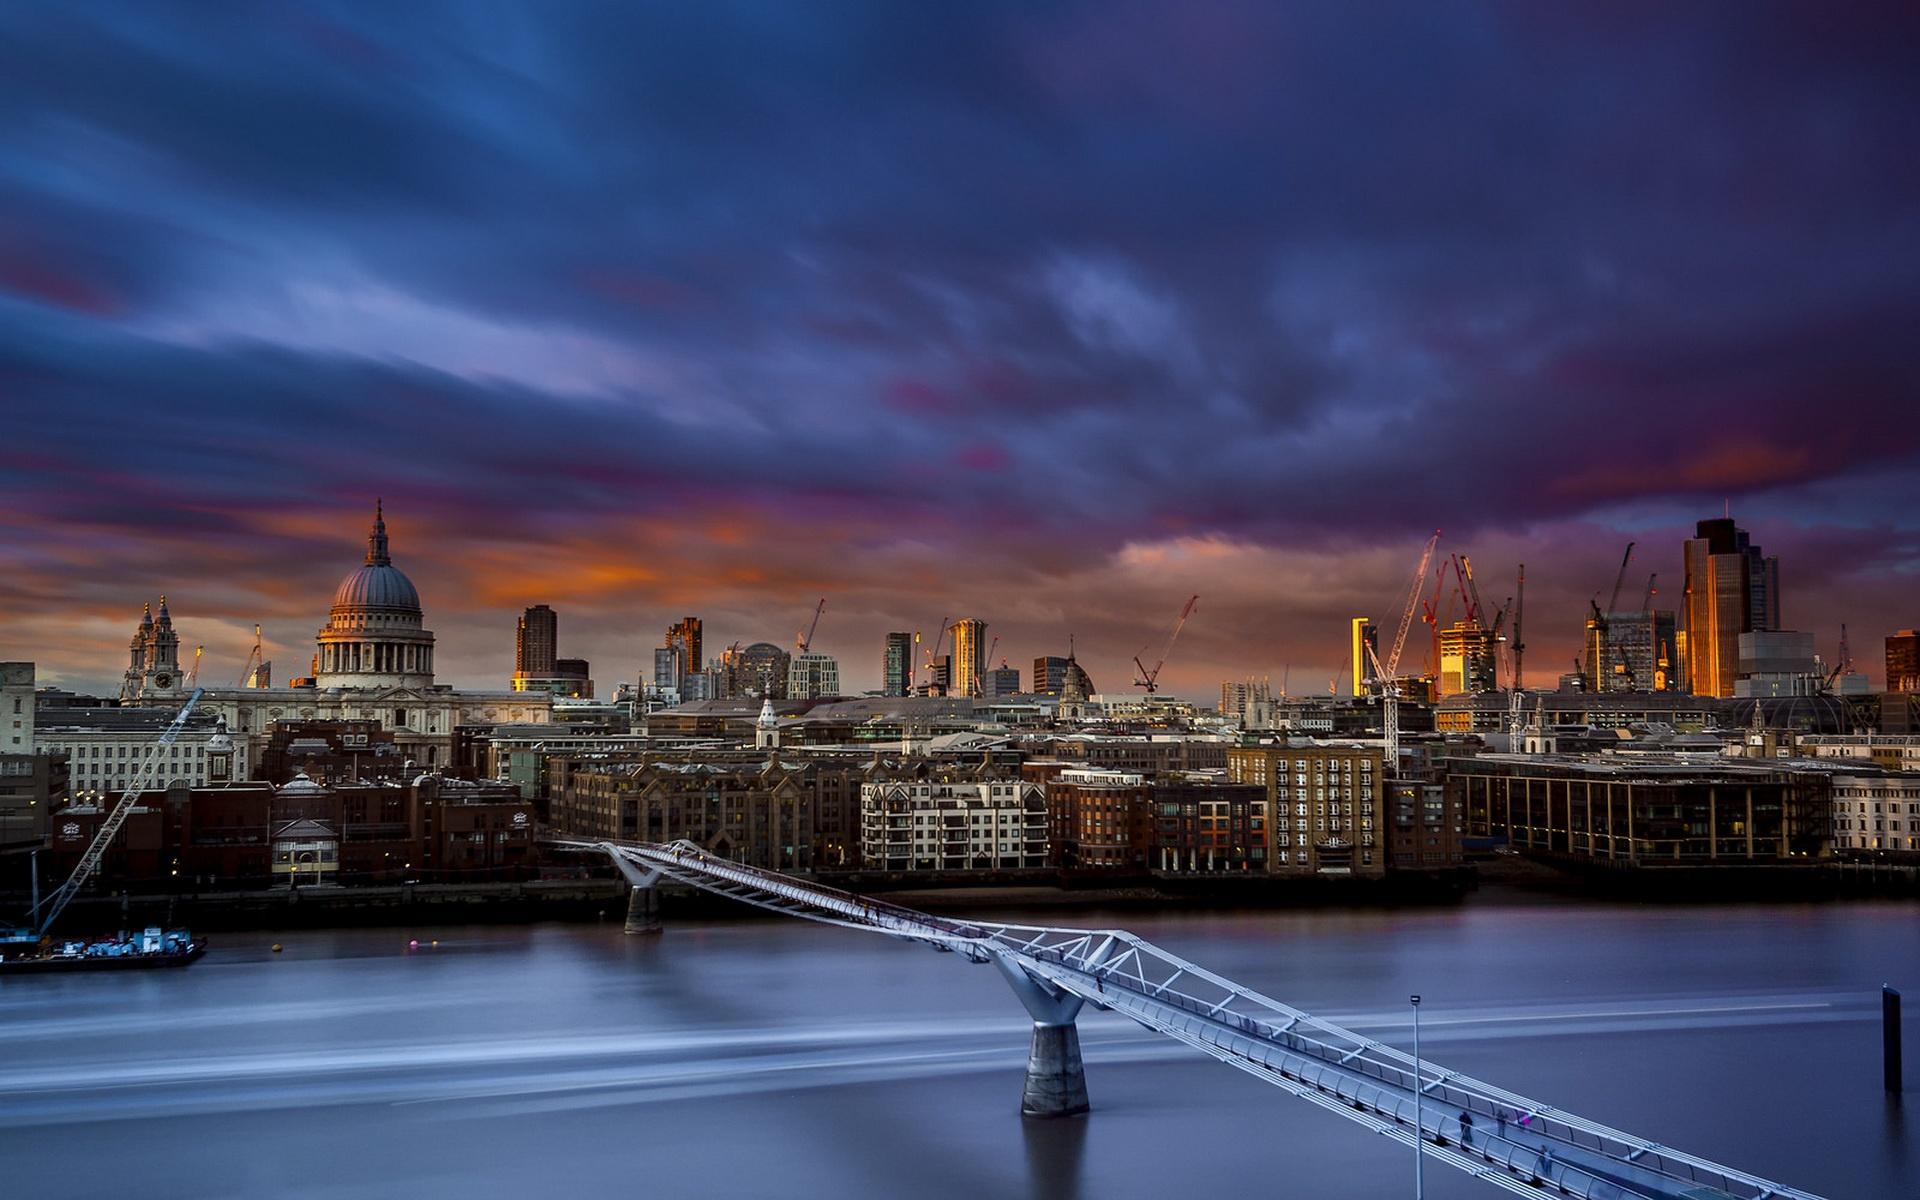 General 1920x1200 London cityscape St. Paul's Cathedral cranes (machine) bridge River Thames England